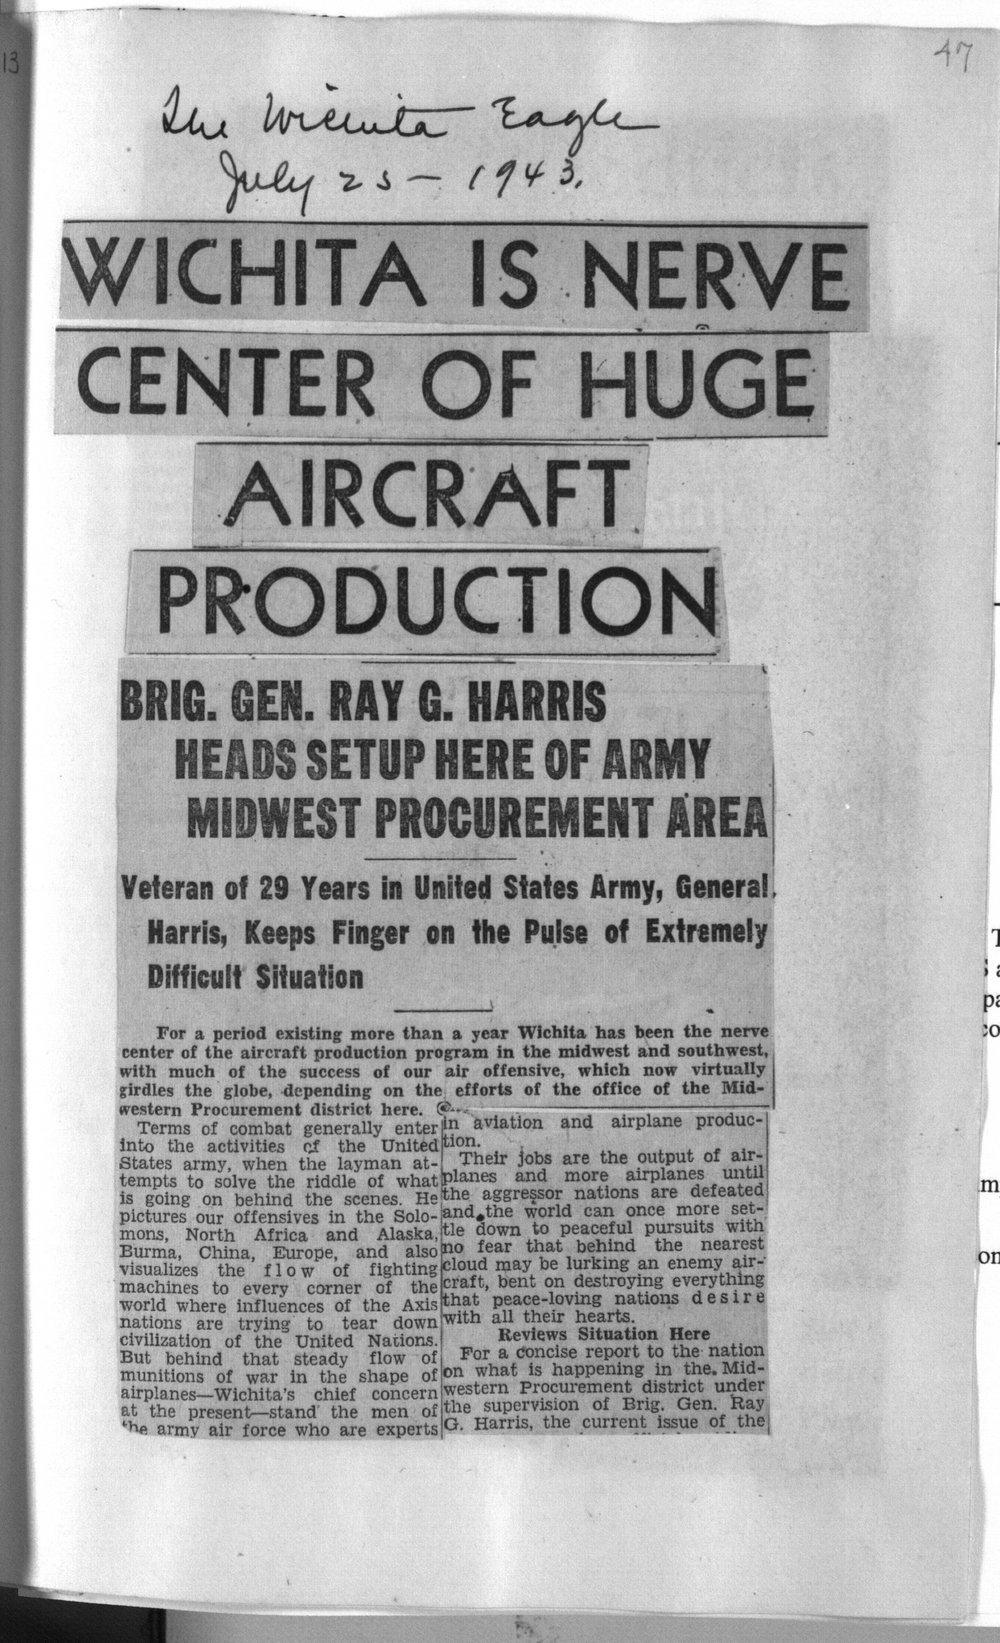 Wichita is nerve center of huge aircraft production - Kansas